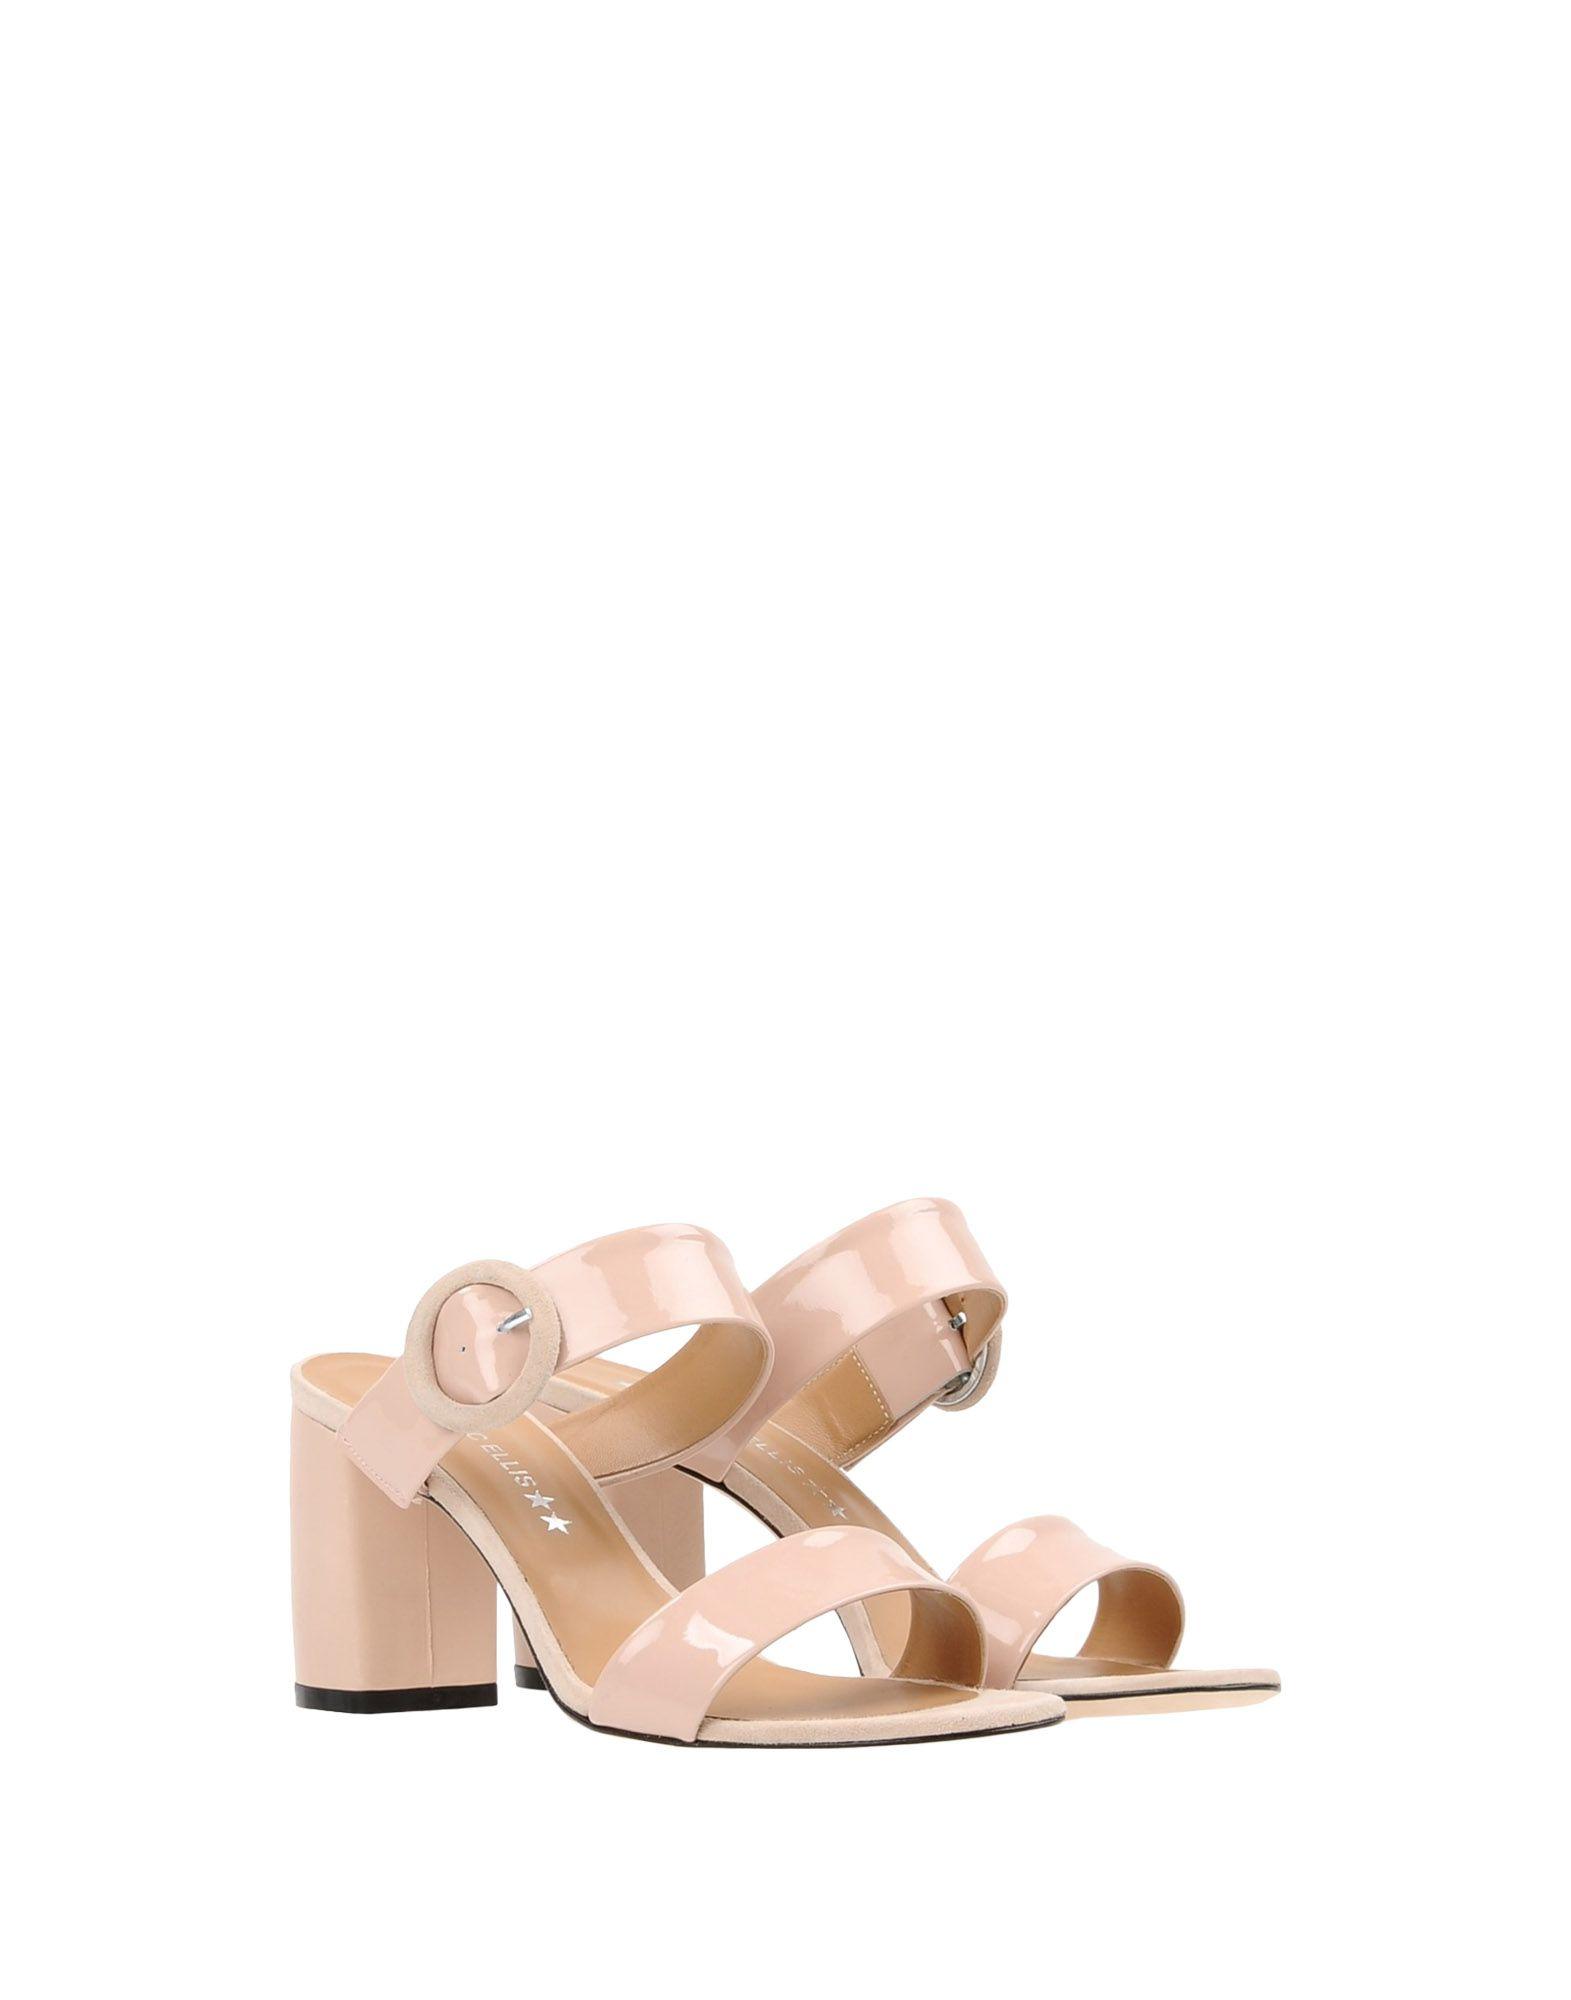 Marc Ellis Sandalen Damen  11398160RR Gute Qualität beliebte Schuhe